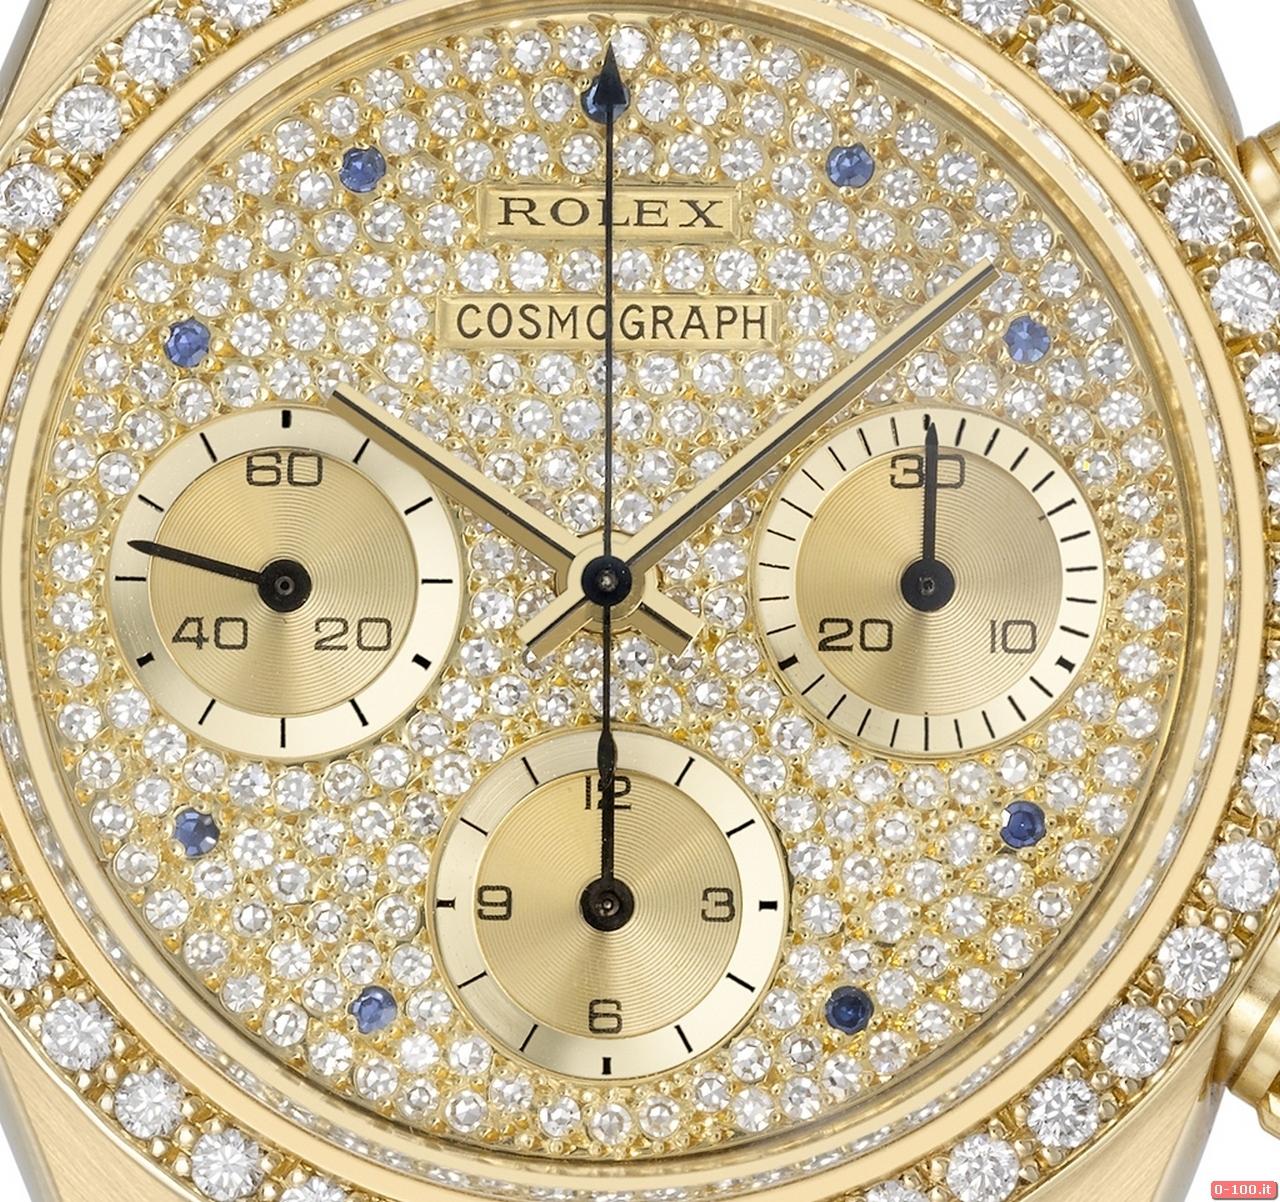 Rolex Jack of Diamonds, Ref. 6269_Christies_0-10030-100